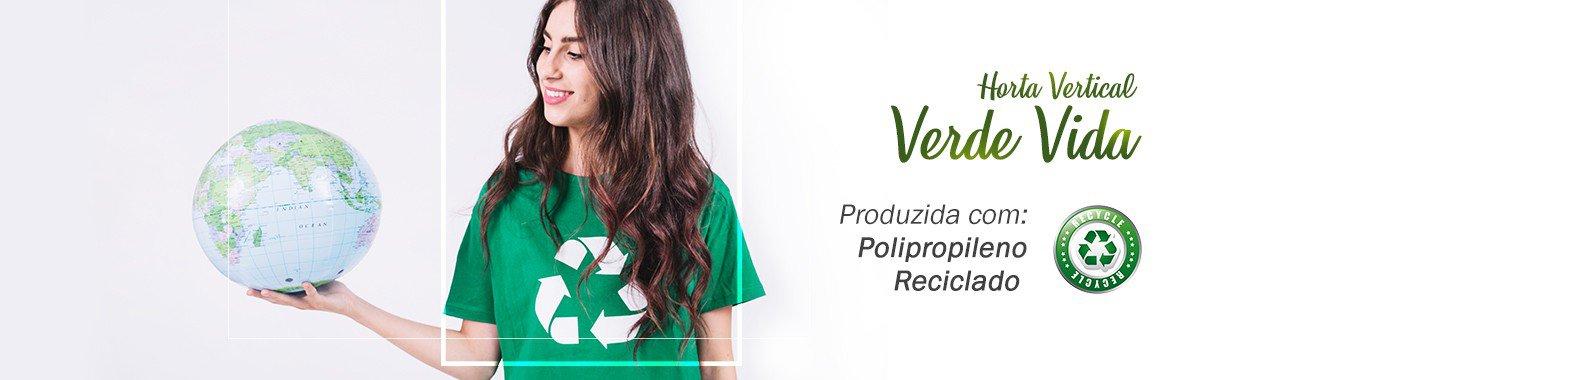 banner-horta-verde-vida-polipropileno